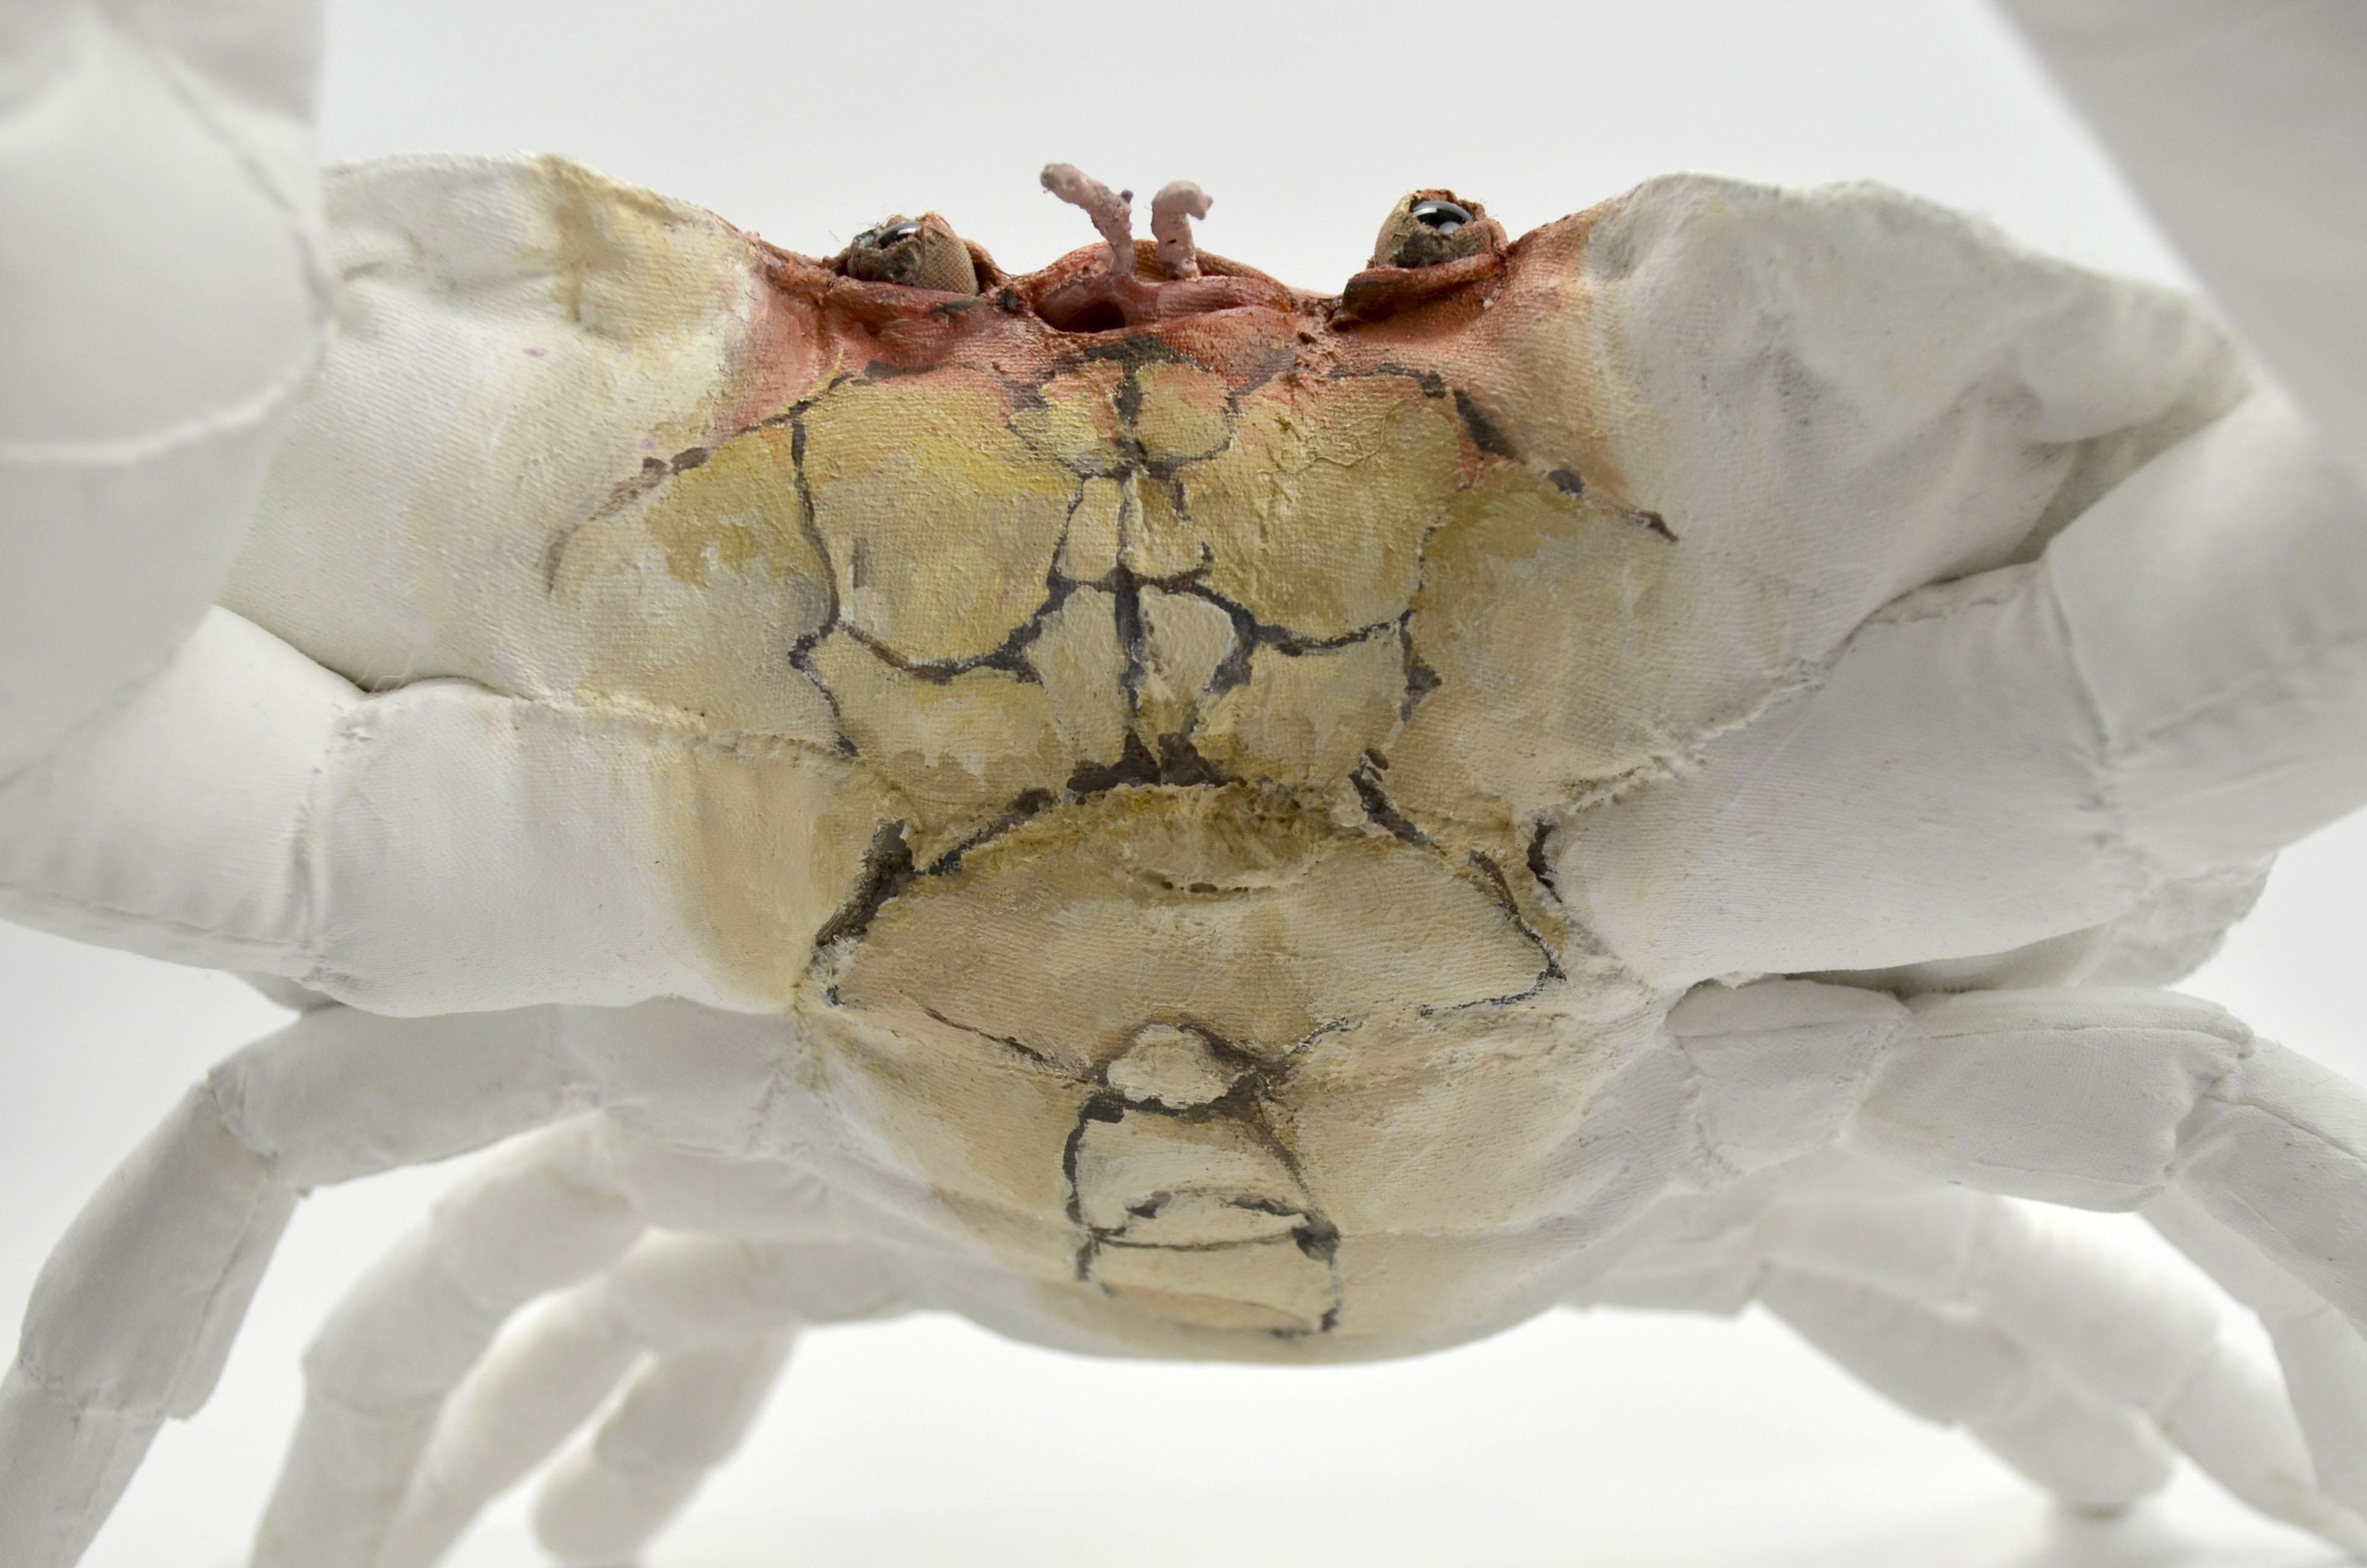 The Defender (Edible Crab) detail